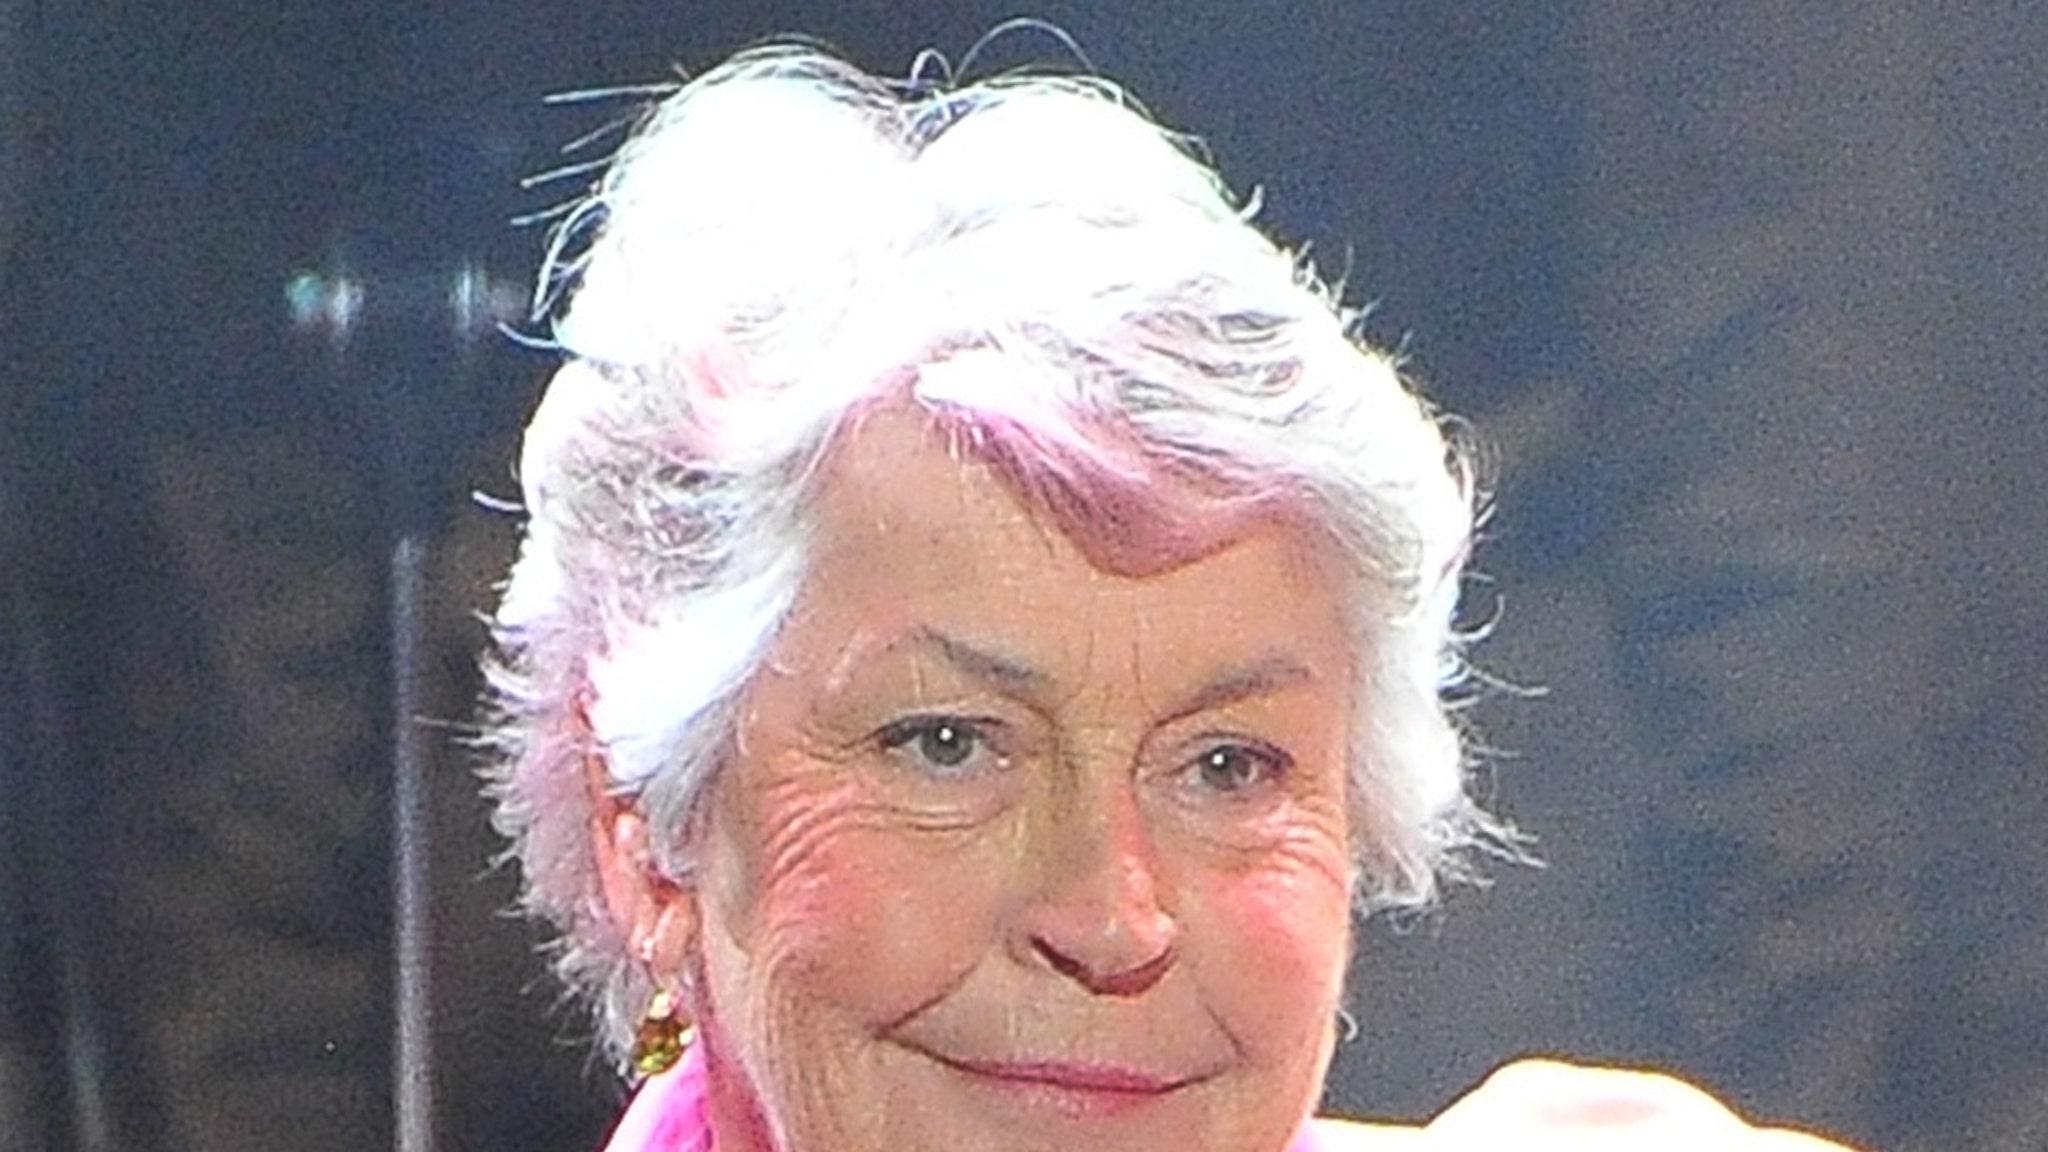 Helen Reddy 'I Am Woman' Singer Dead at 78